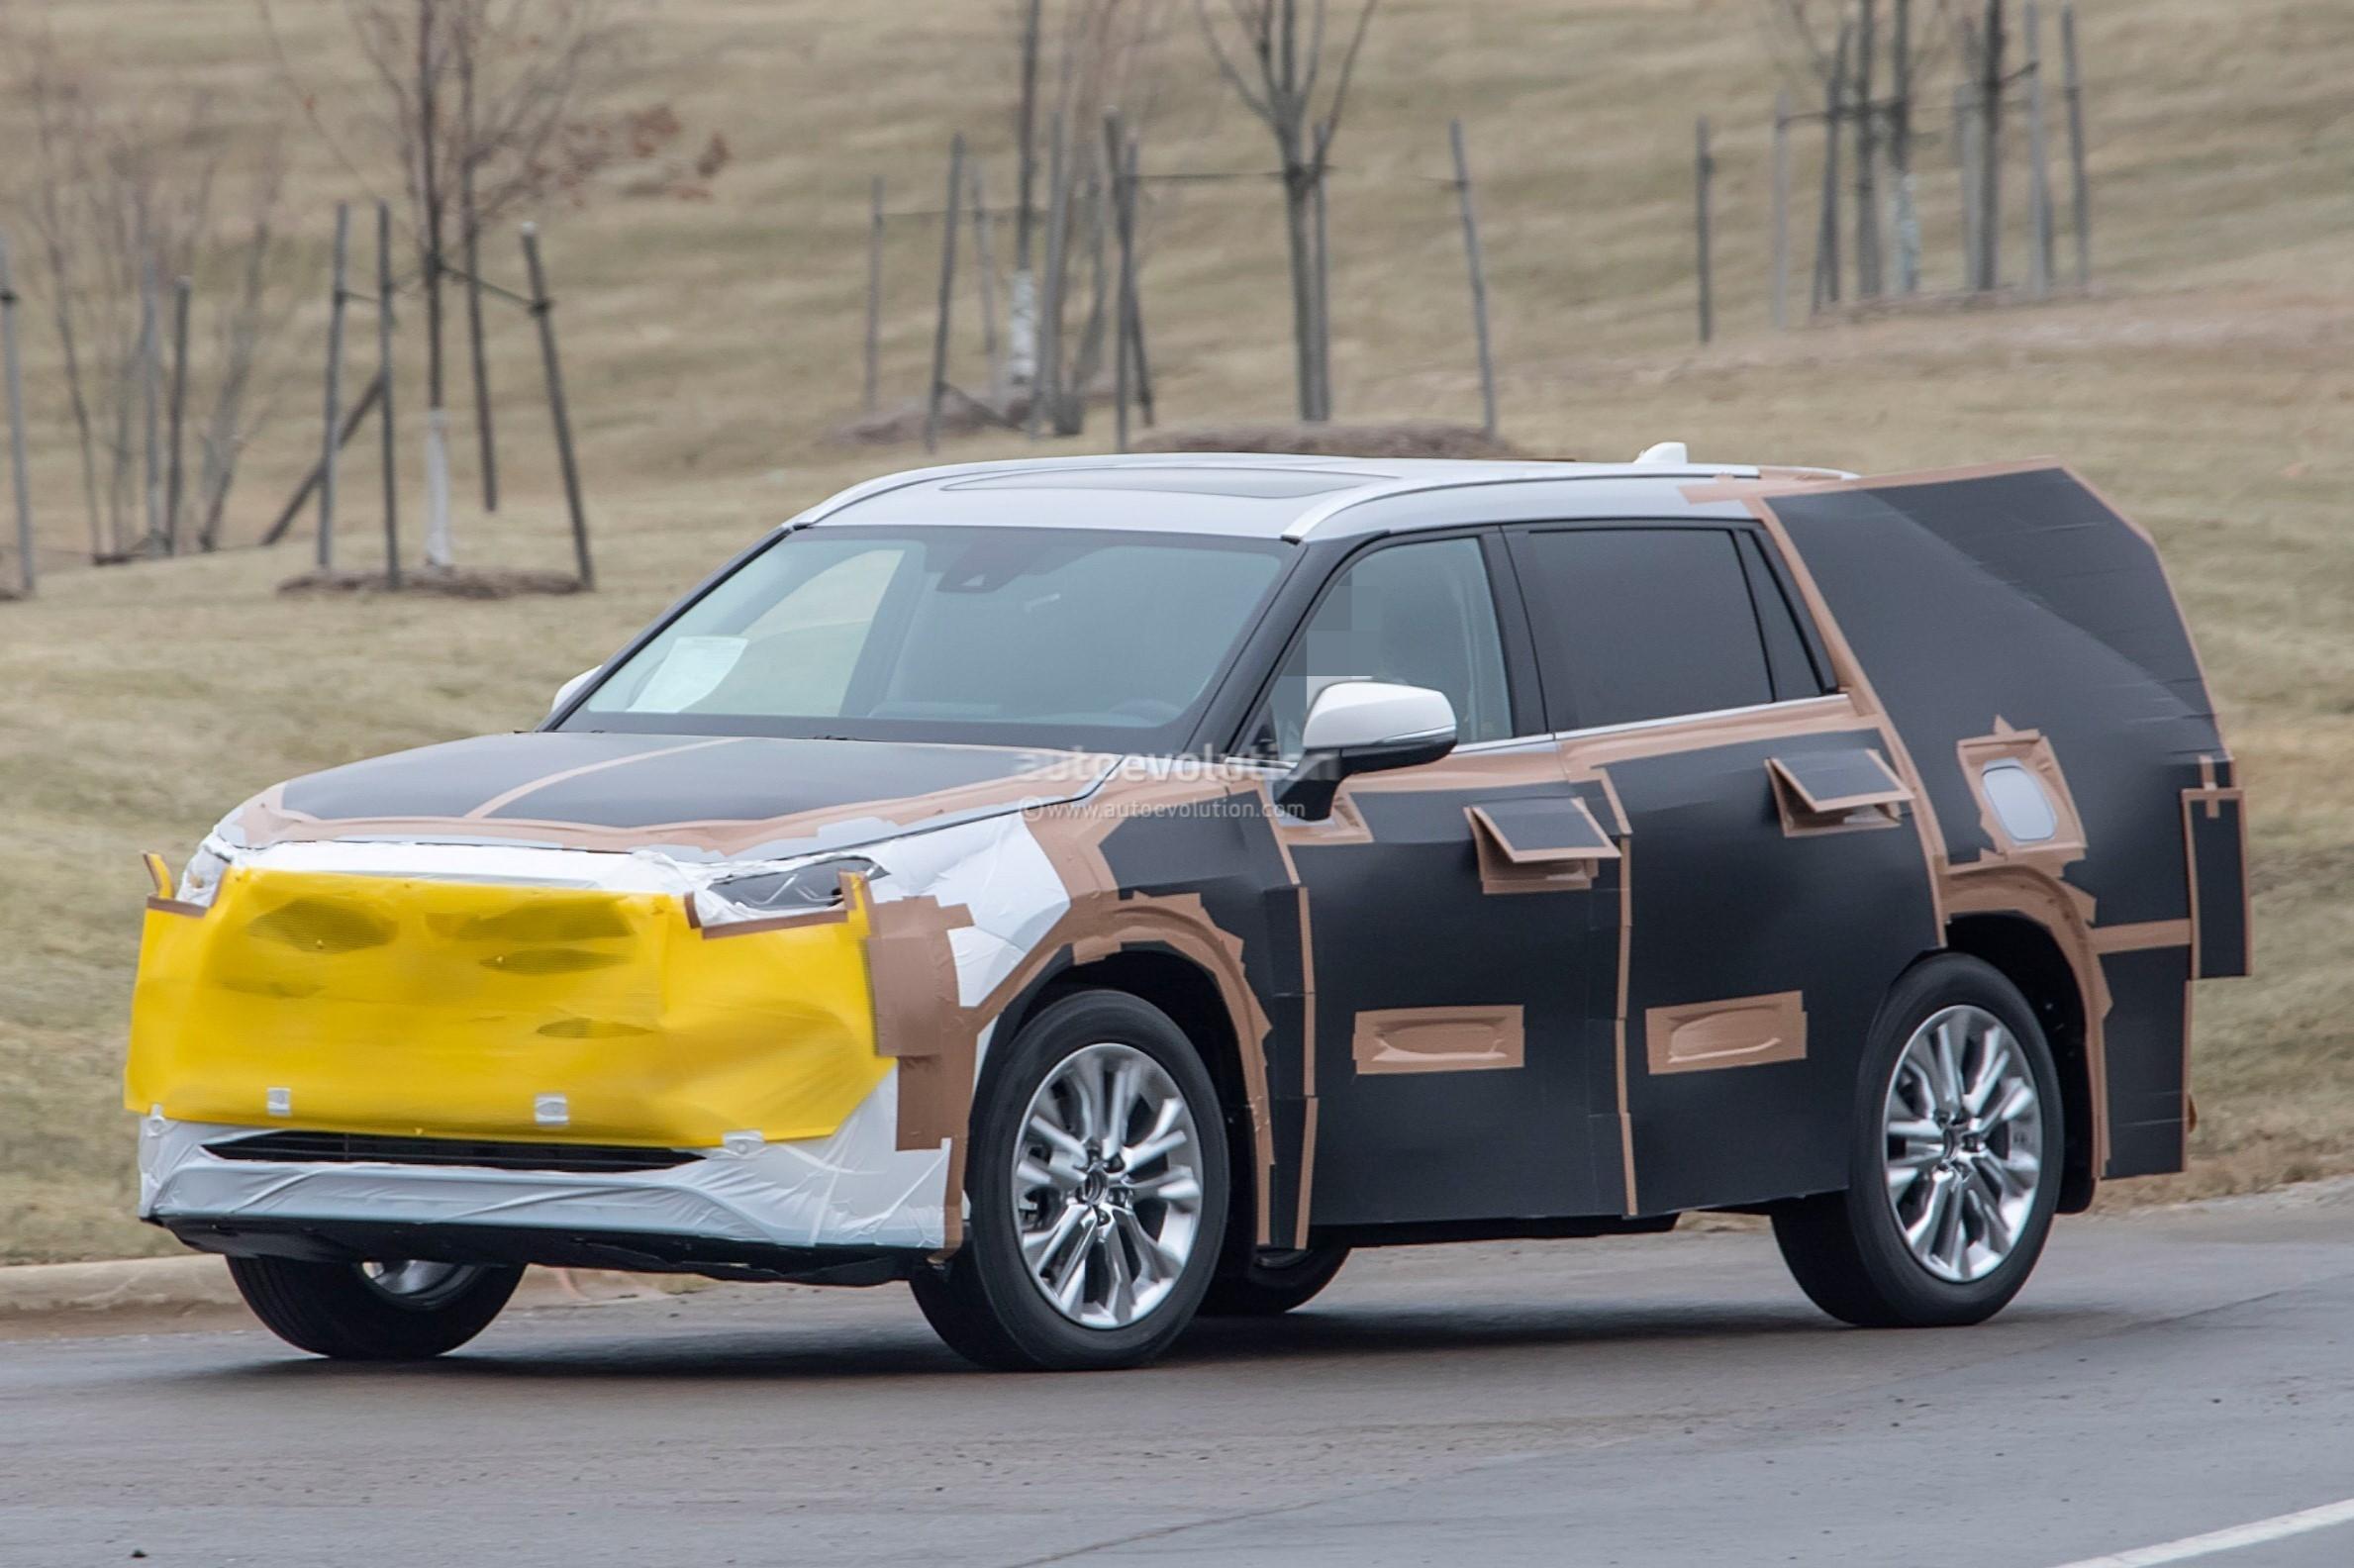 2020 Toyota Highlander Spied Features RAV4 Inspired Front